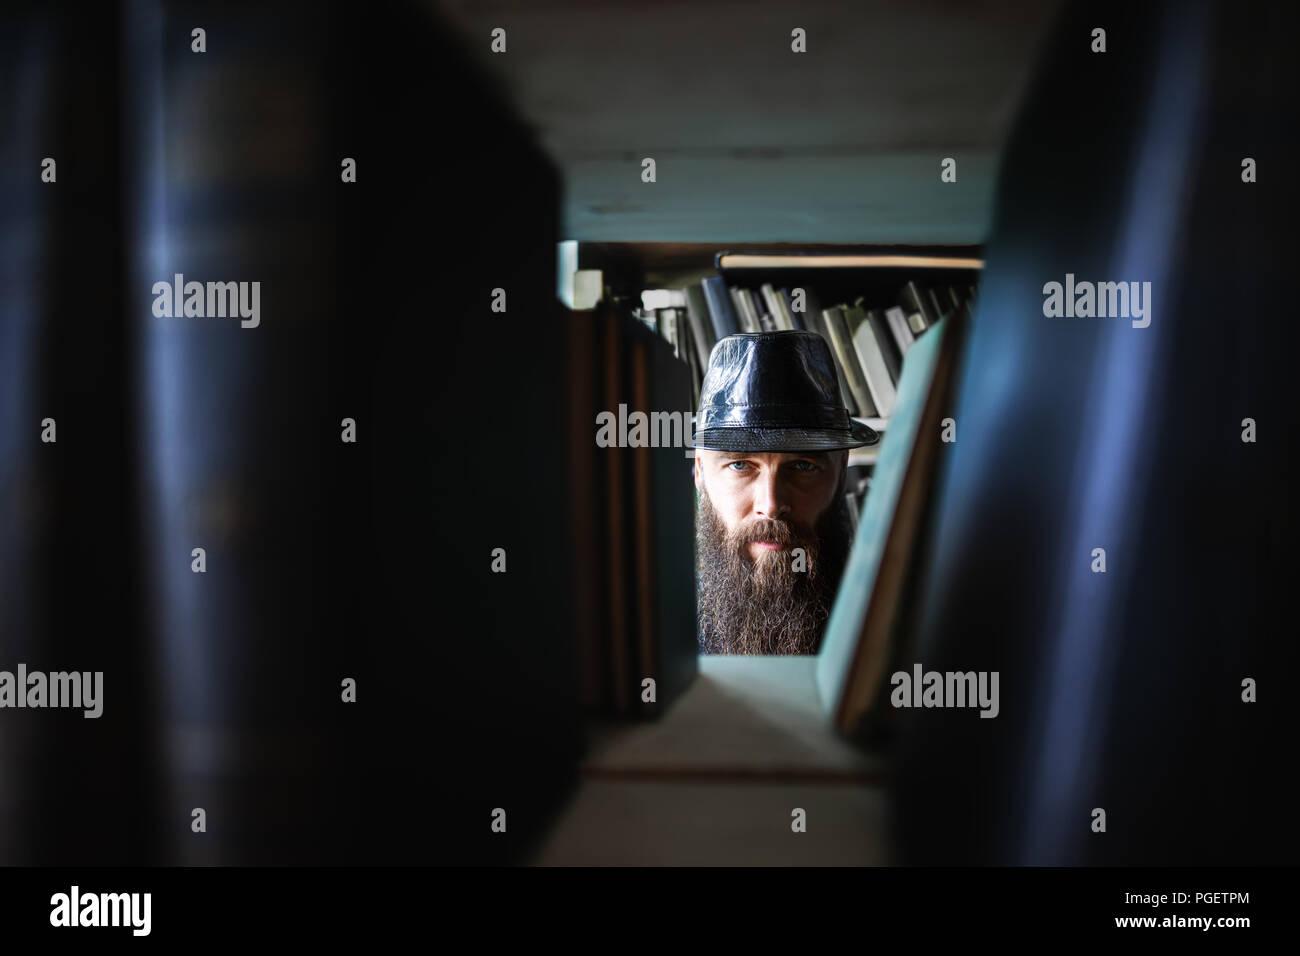 Hombre Barbado espiar a través de misterio сoncept estanterías. Imagen De Stock